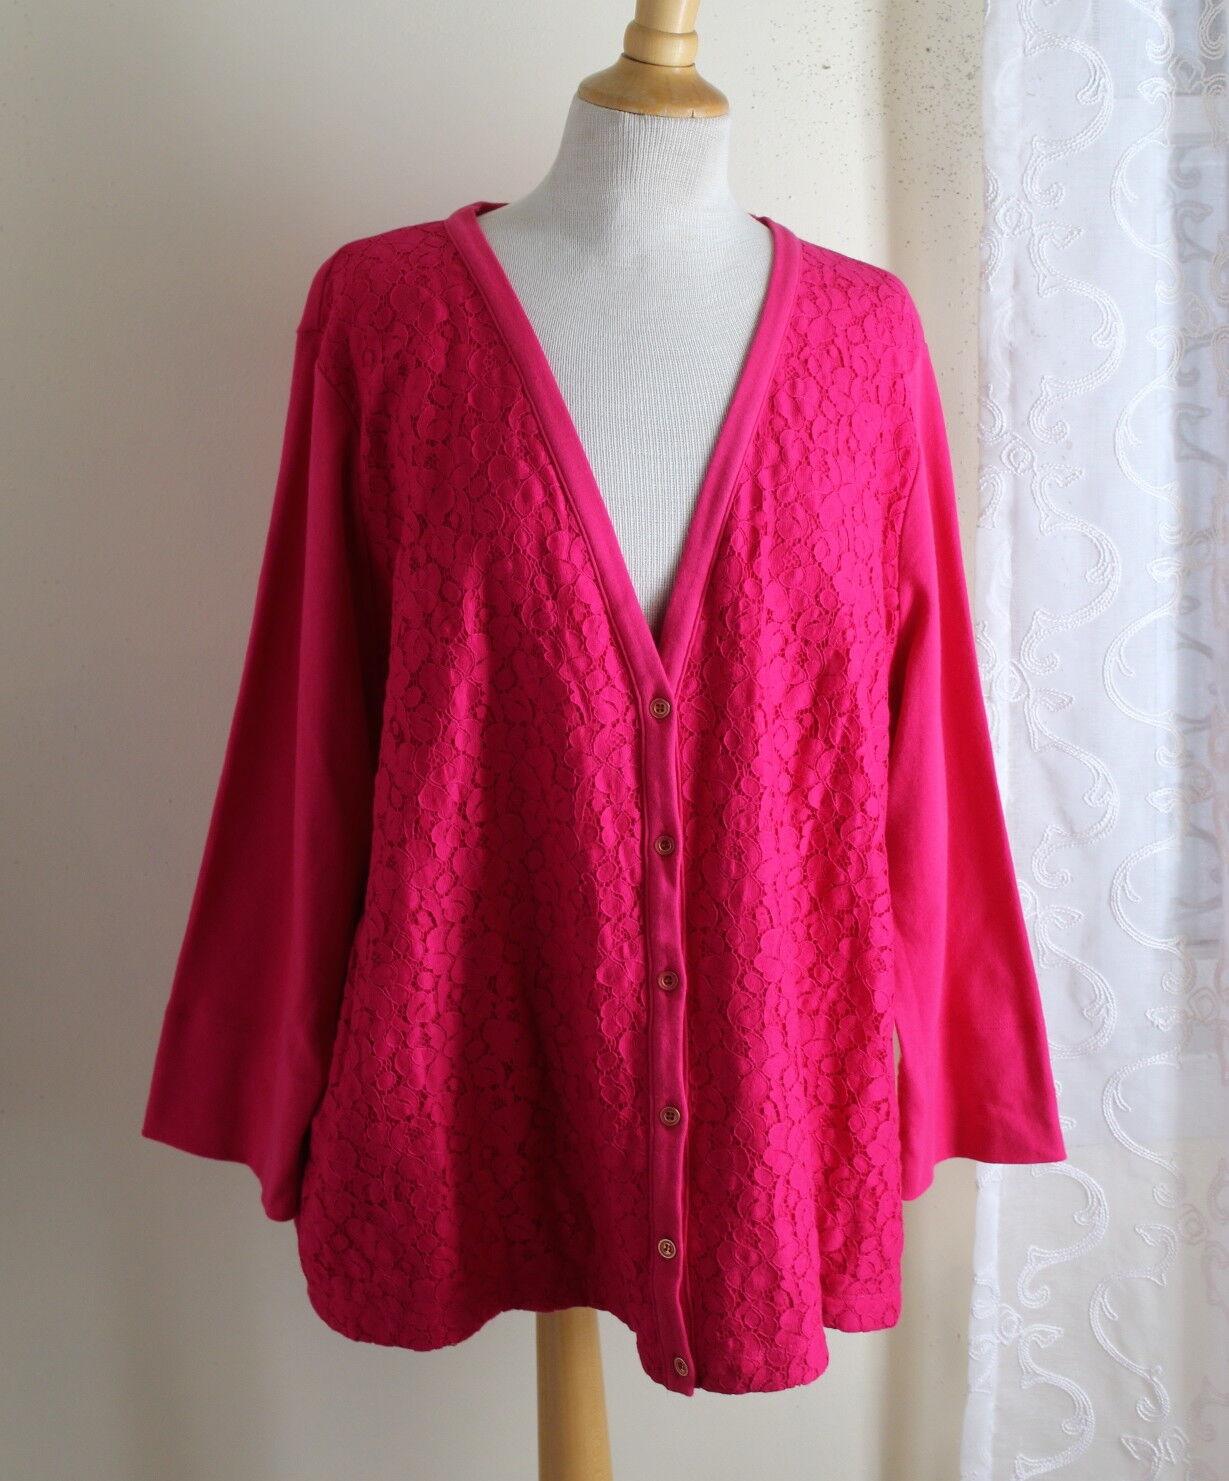 Jones New York Sz 3X Fuchsia Rosa Art-to-Wear Lace Overlay Cardigan Shirt Jacket